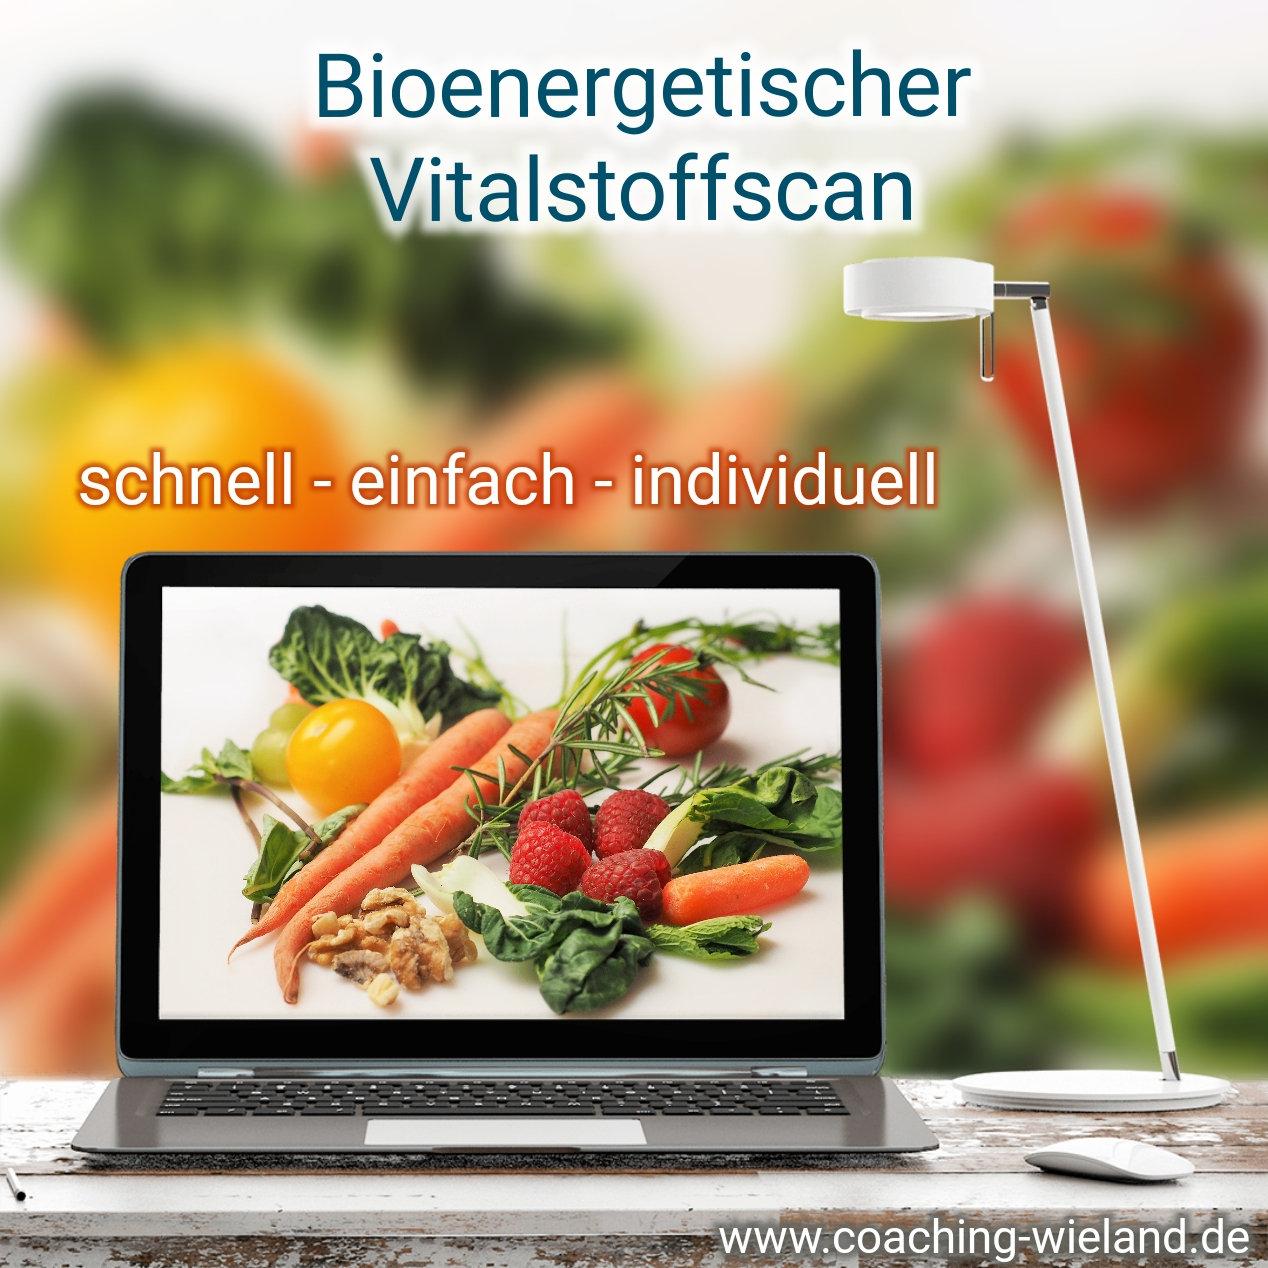 Bioenergetischer Vitalstoffscan